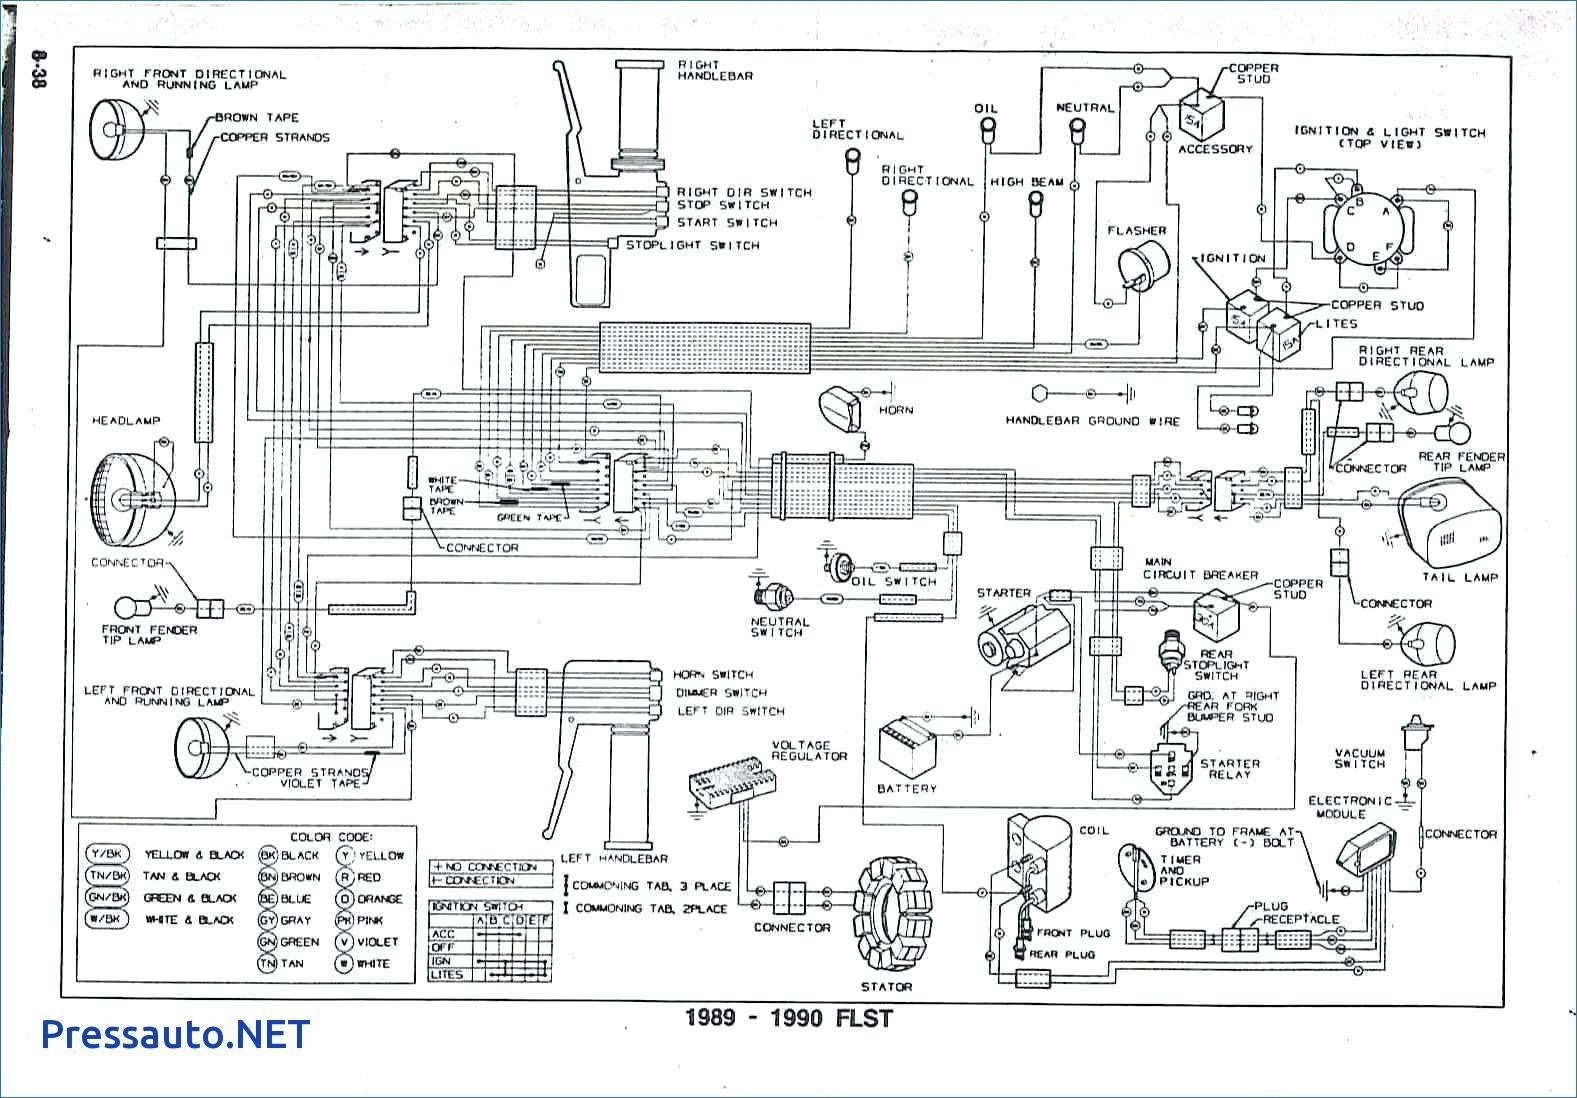 1970 Harley Shovelhead Wiring Diagram Inspirational